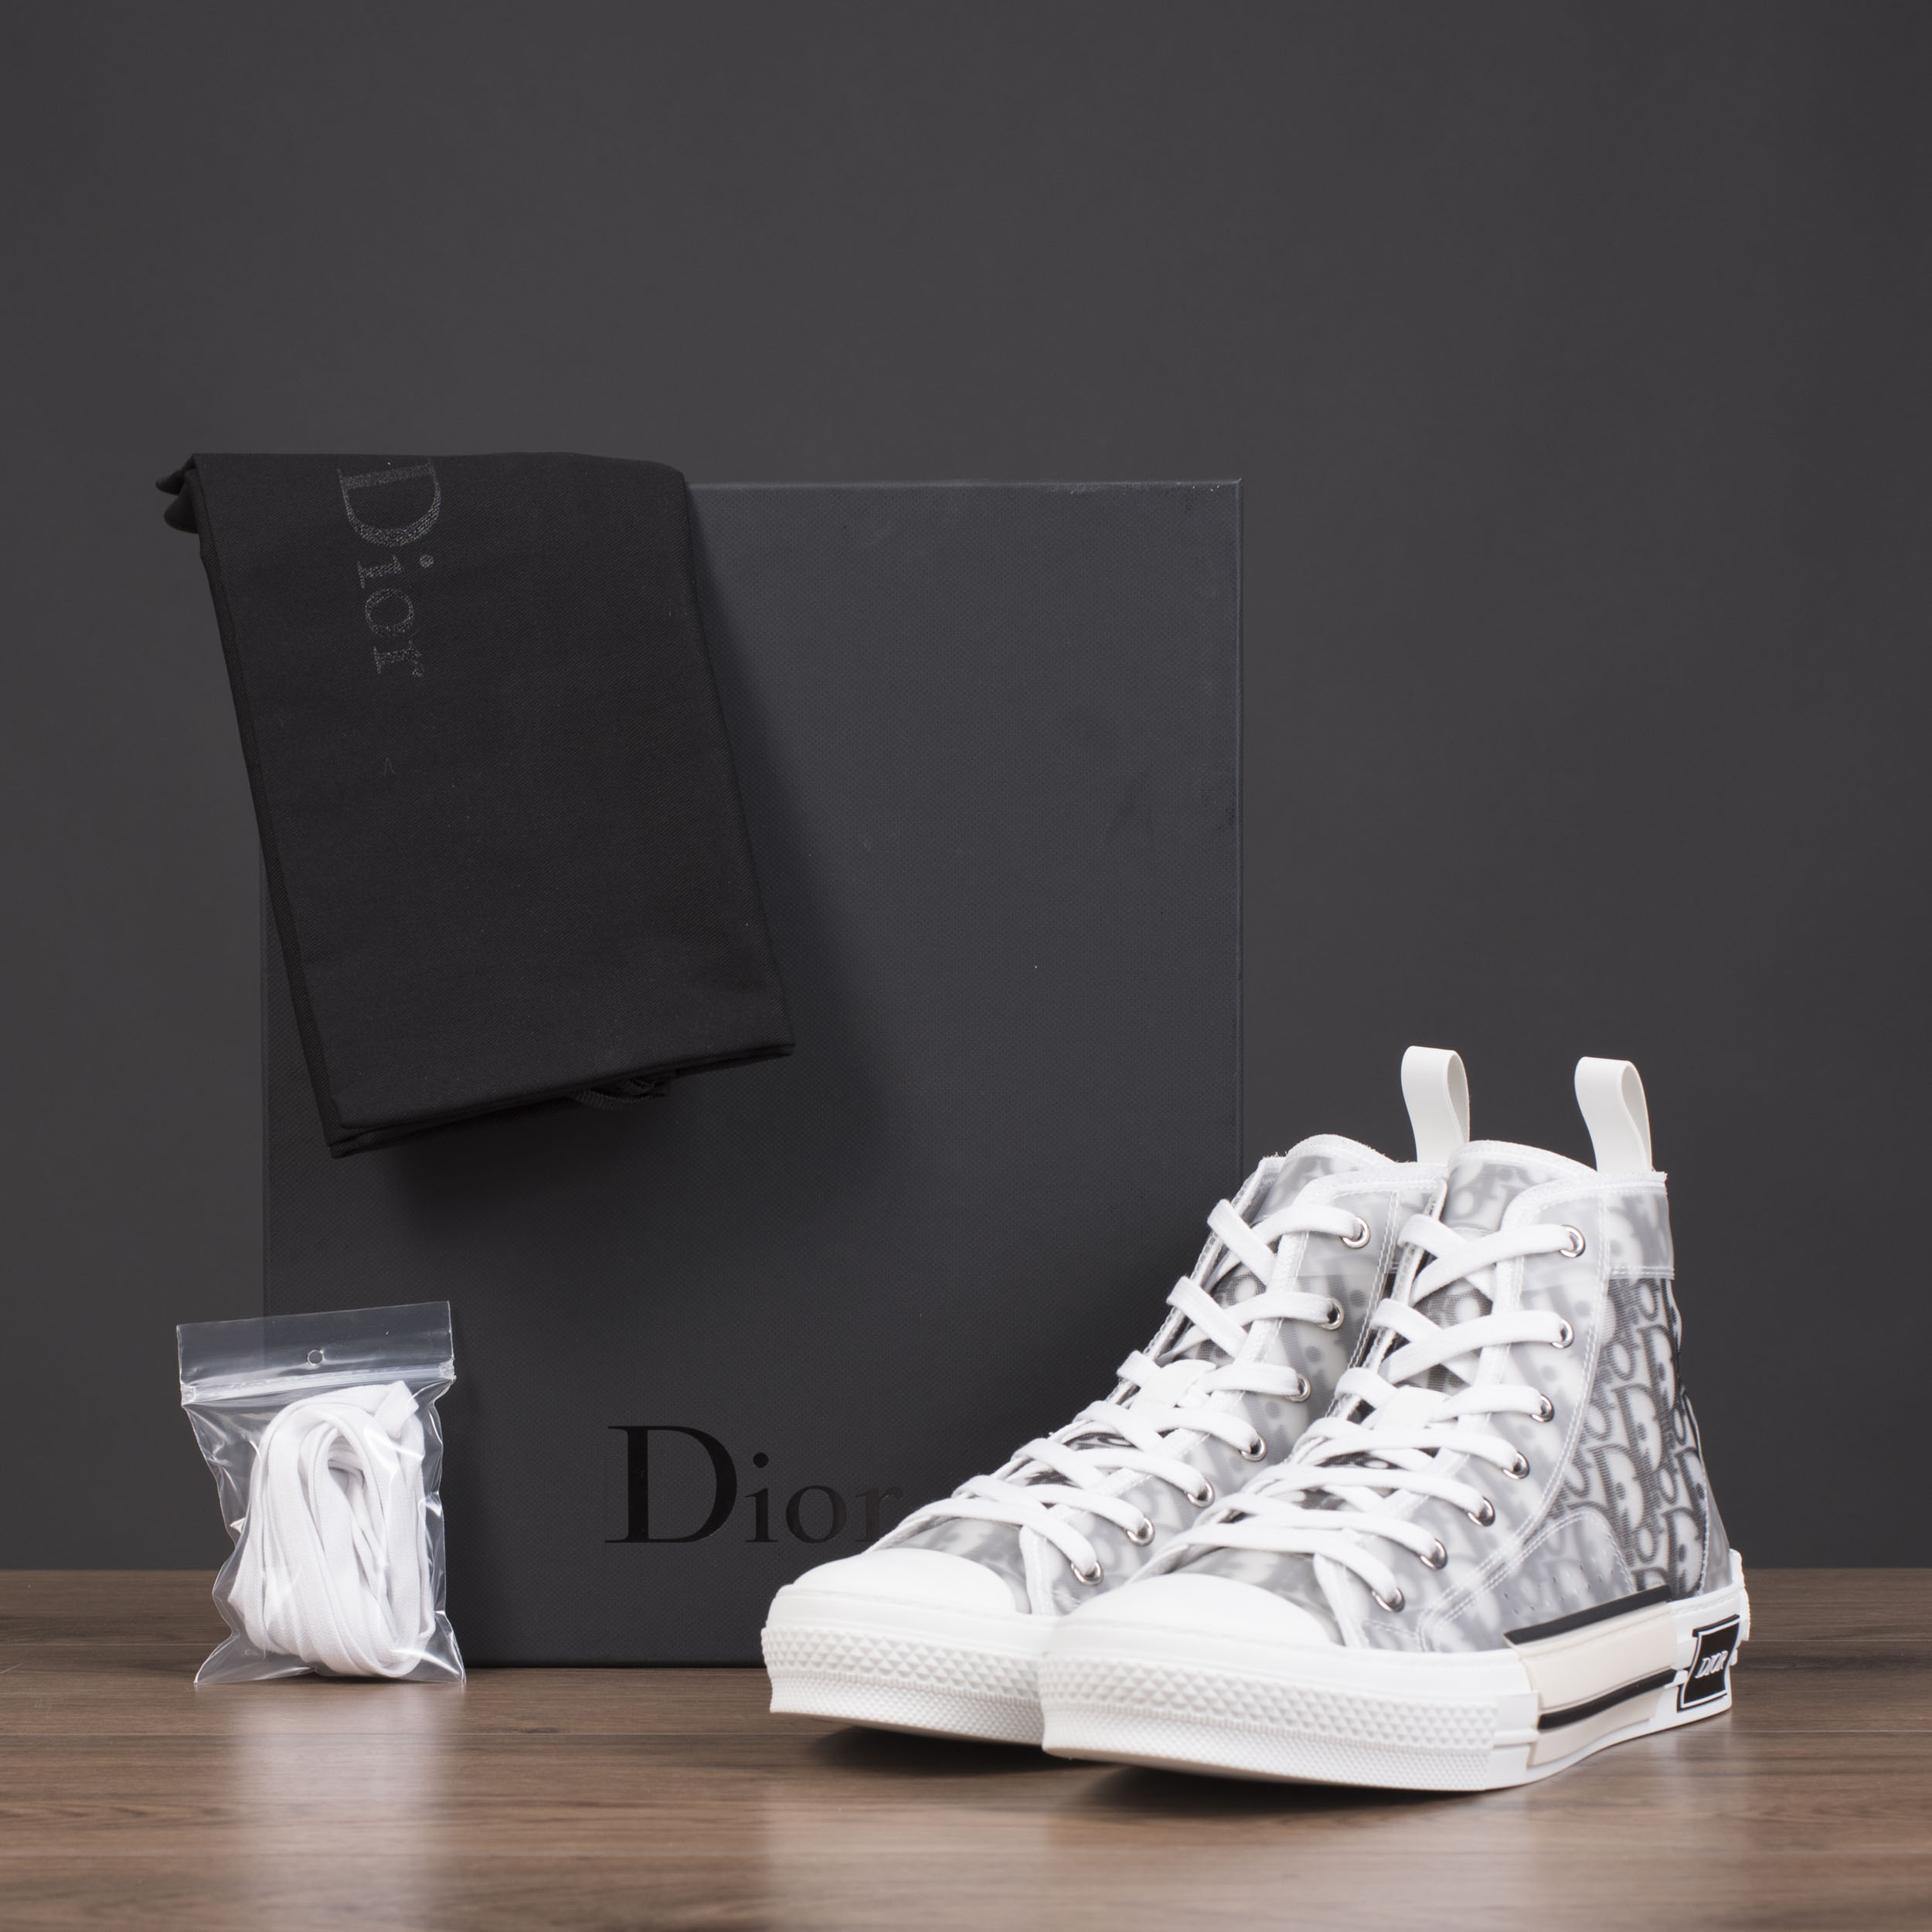 aa74c7371eaf21 Dior ×. Dior x Kaws B23 High Top Sneakers In Dior Oblique